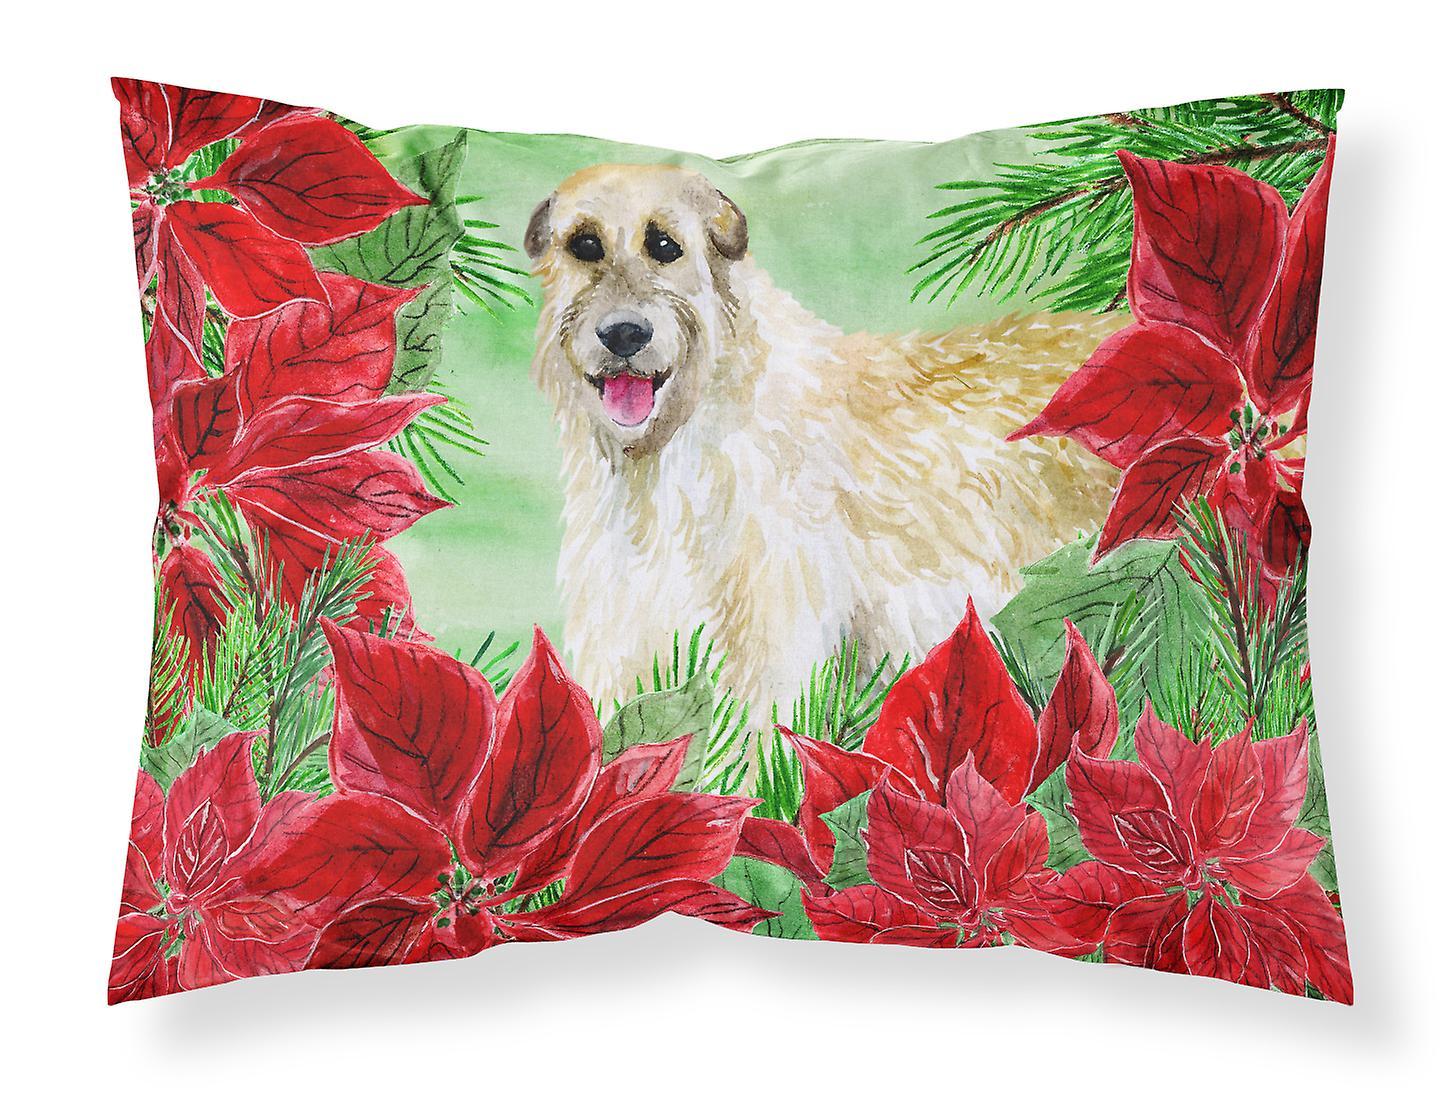 Poinsettias D'oreiller Standard Du Tissu Irish Wolfhound De Taie BdoWCxre